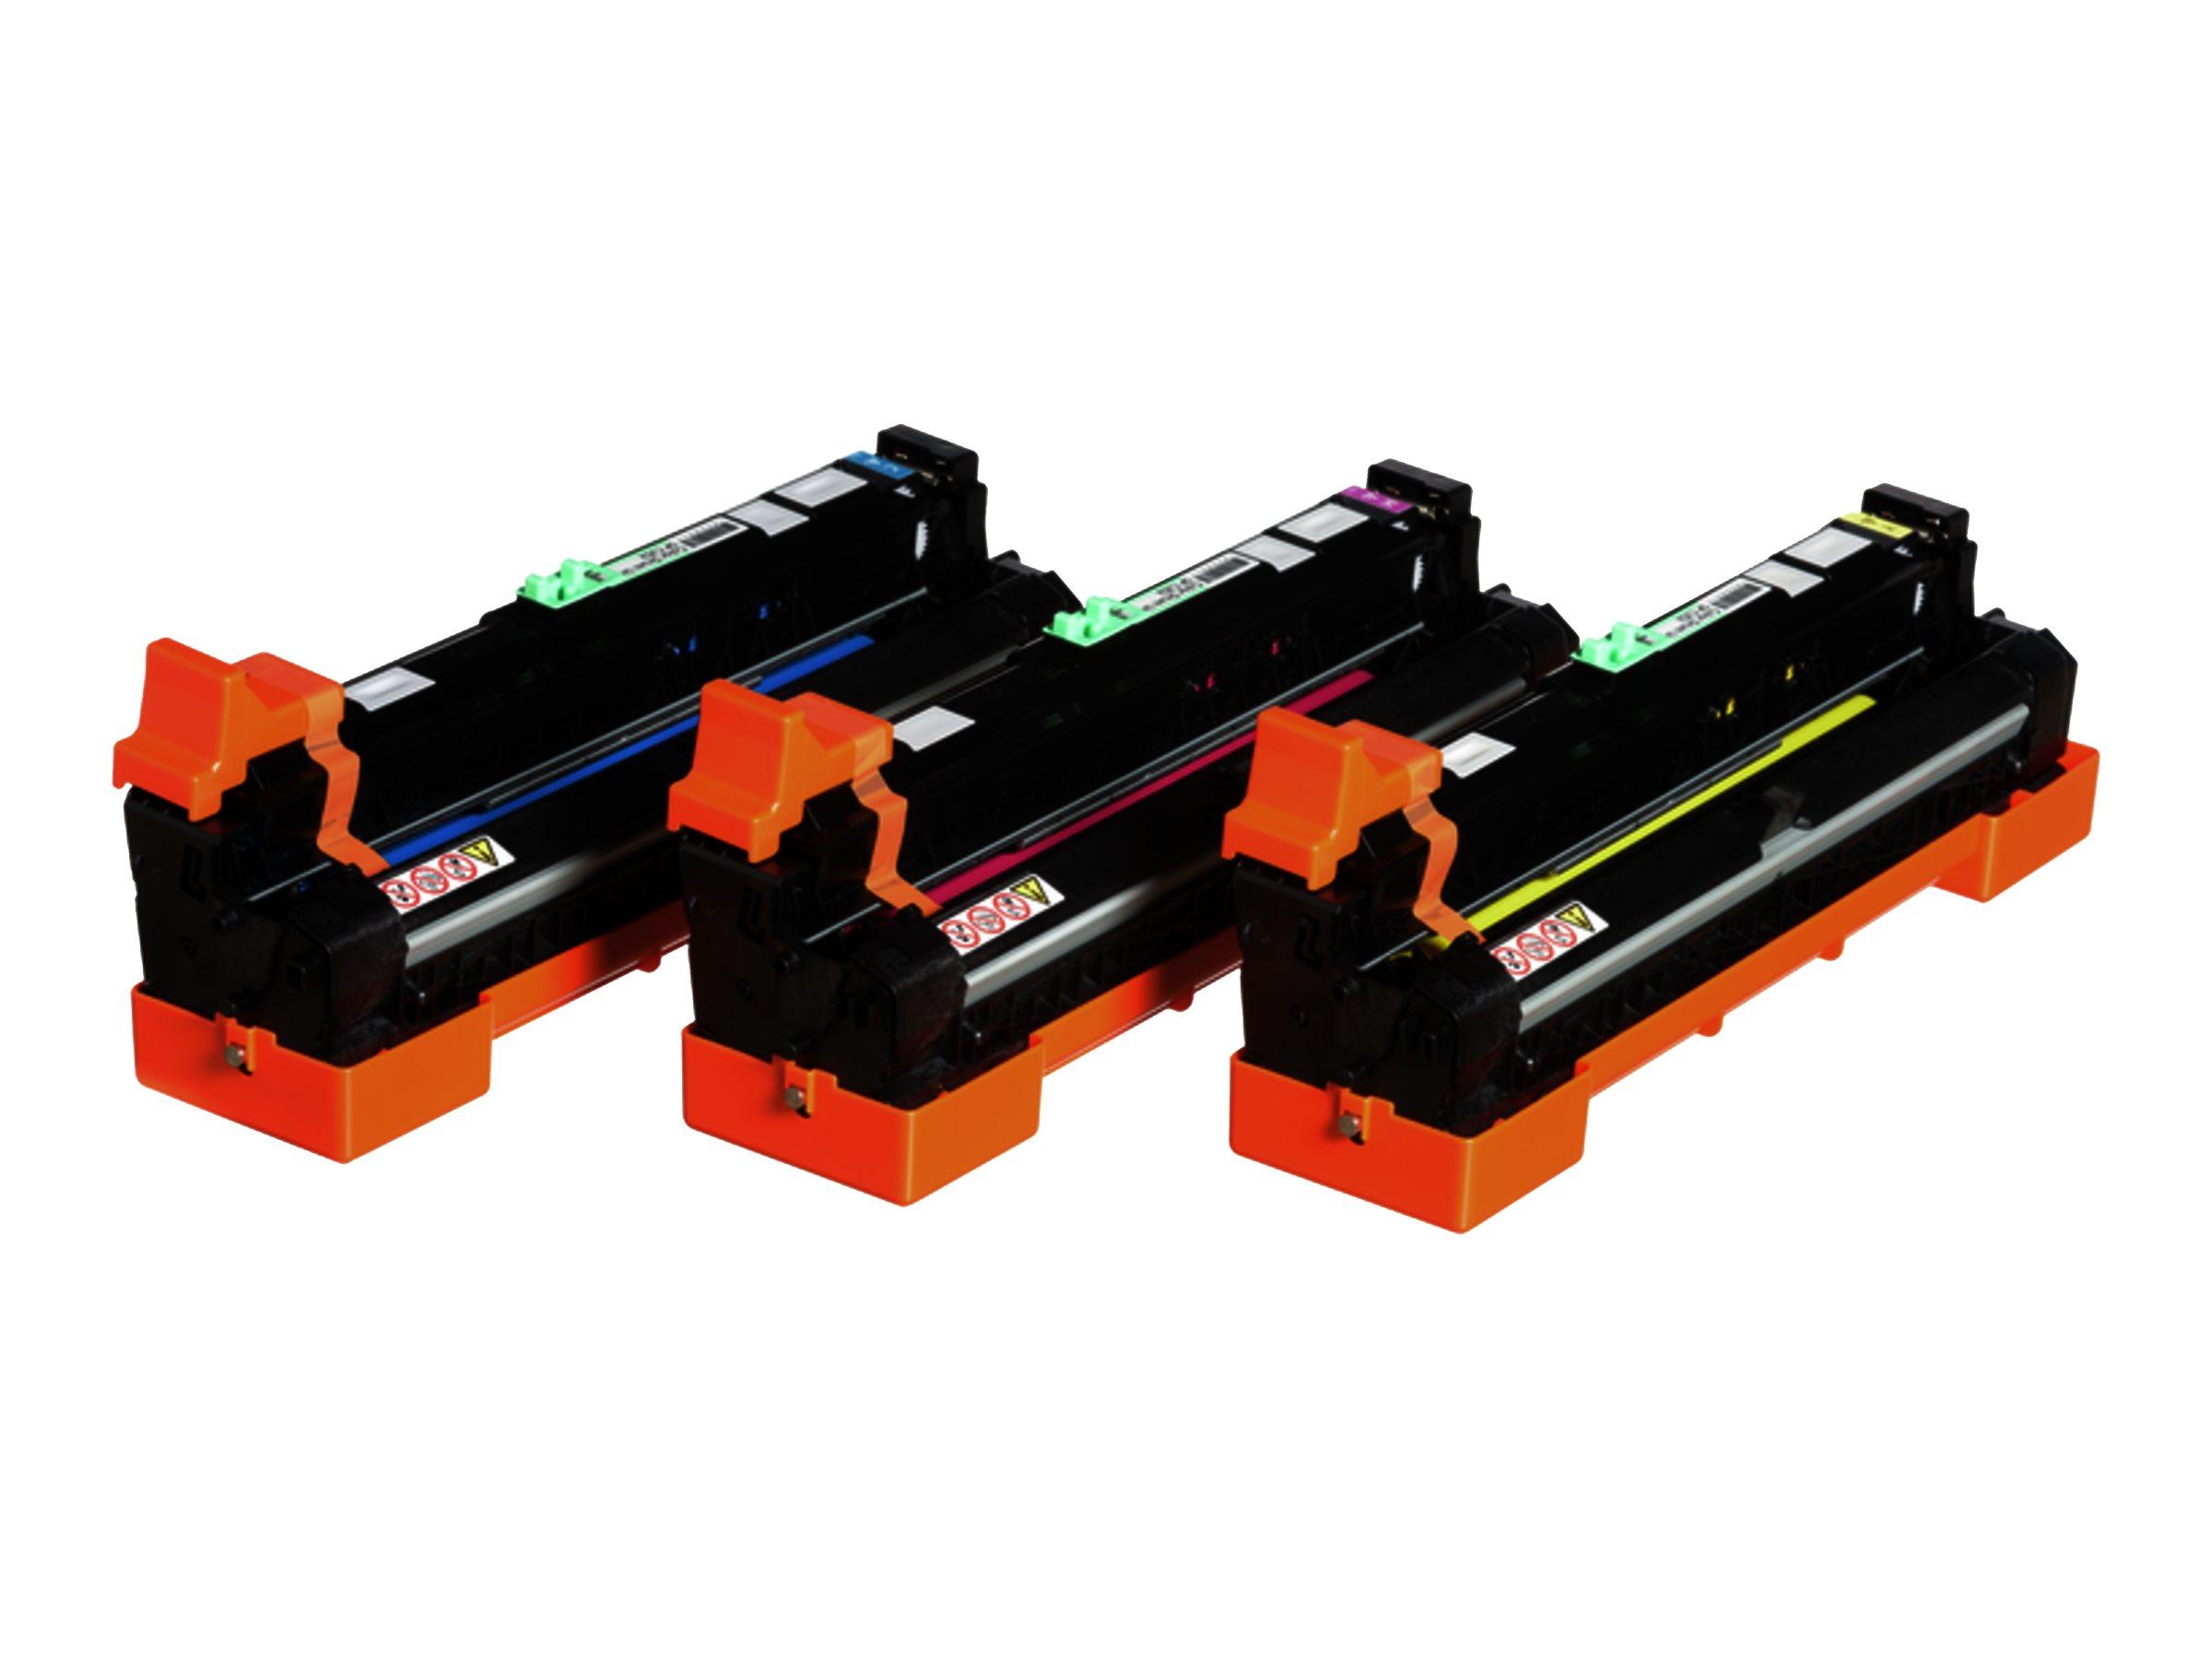 Ricoh Drum Unit SP C352 - Farbe (Cyan, Magenta, Gelb) - Trommel-Kit - für Ricoh SP C352DN, SP C360DNw, SP C360SFNw, SP C360SNw